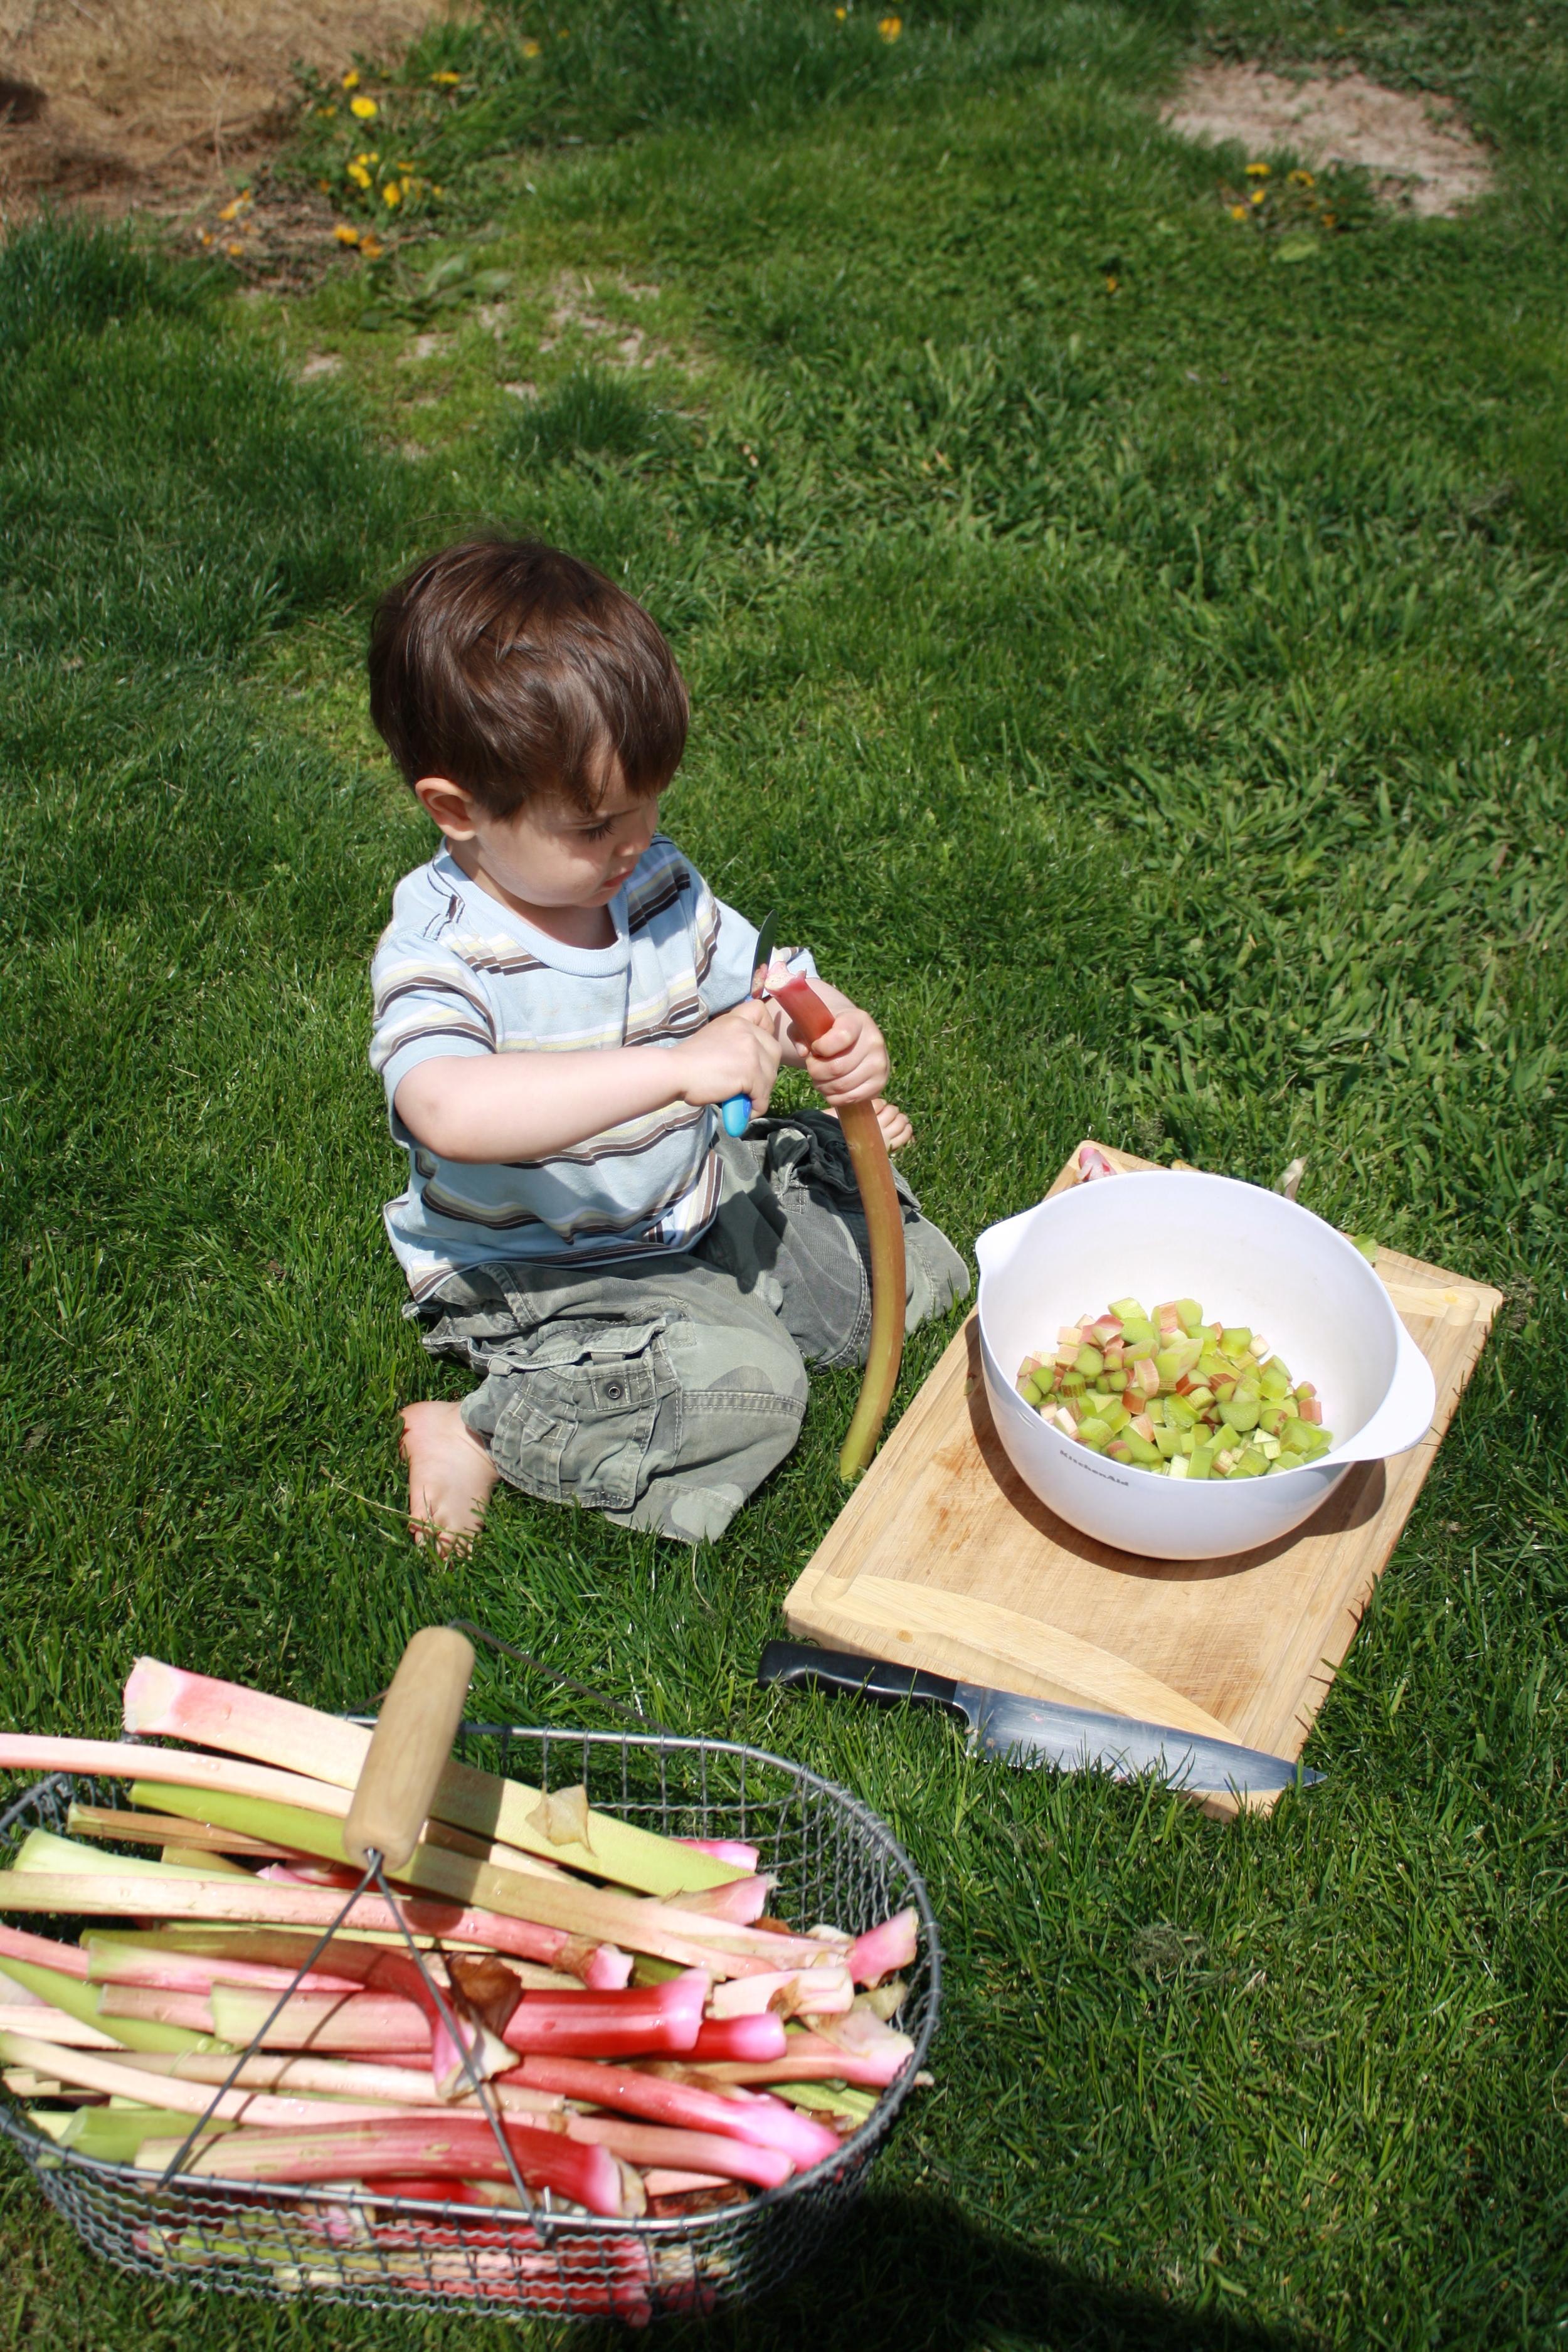 Clark at 2 helping me chop rhubarb for jam.